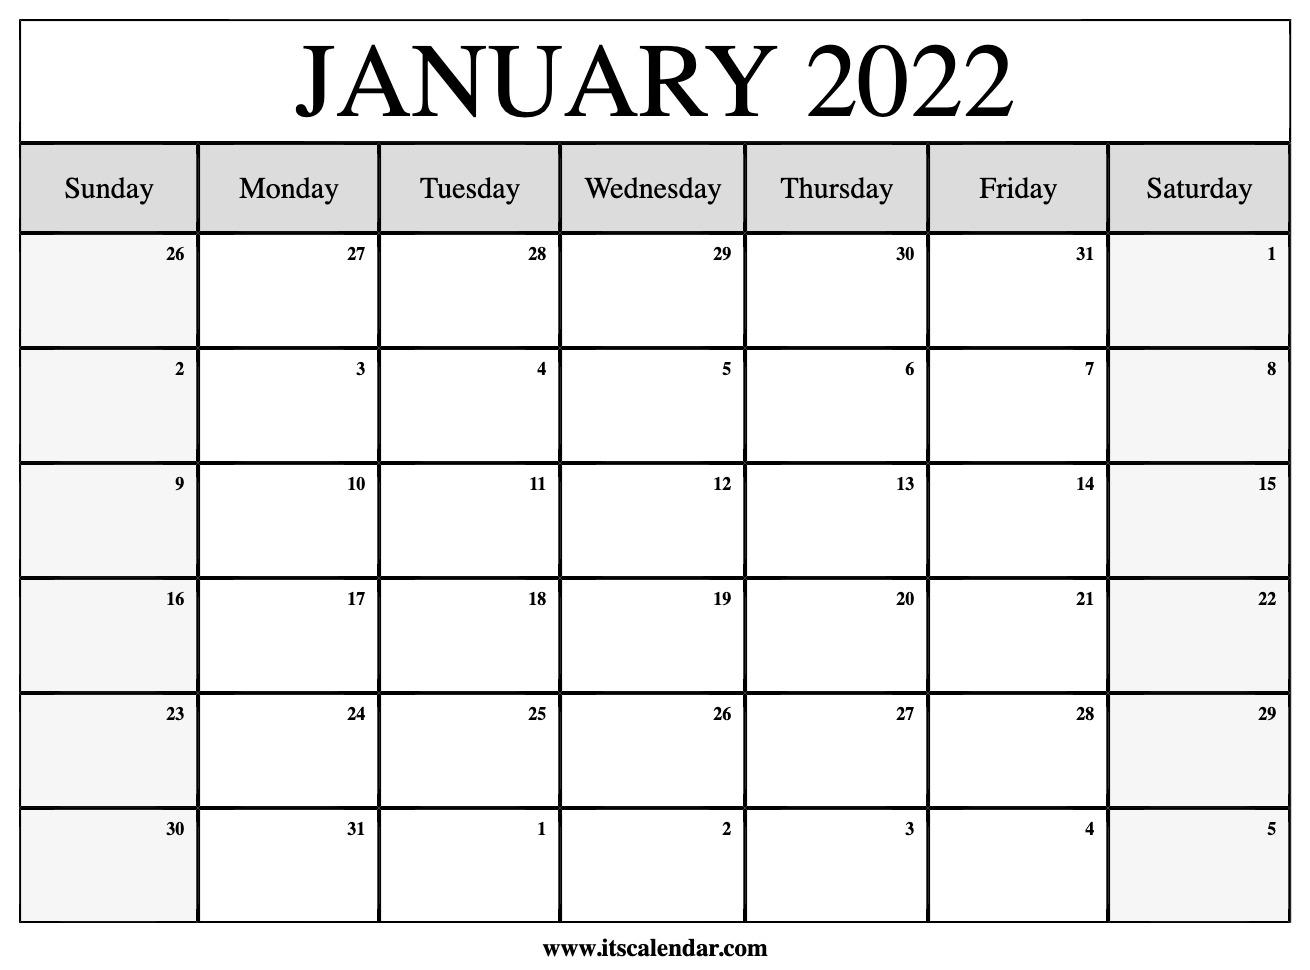 Free Printable January 2022 Calendar In Printable Calendar October 2022 To January 2022